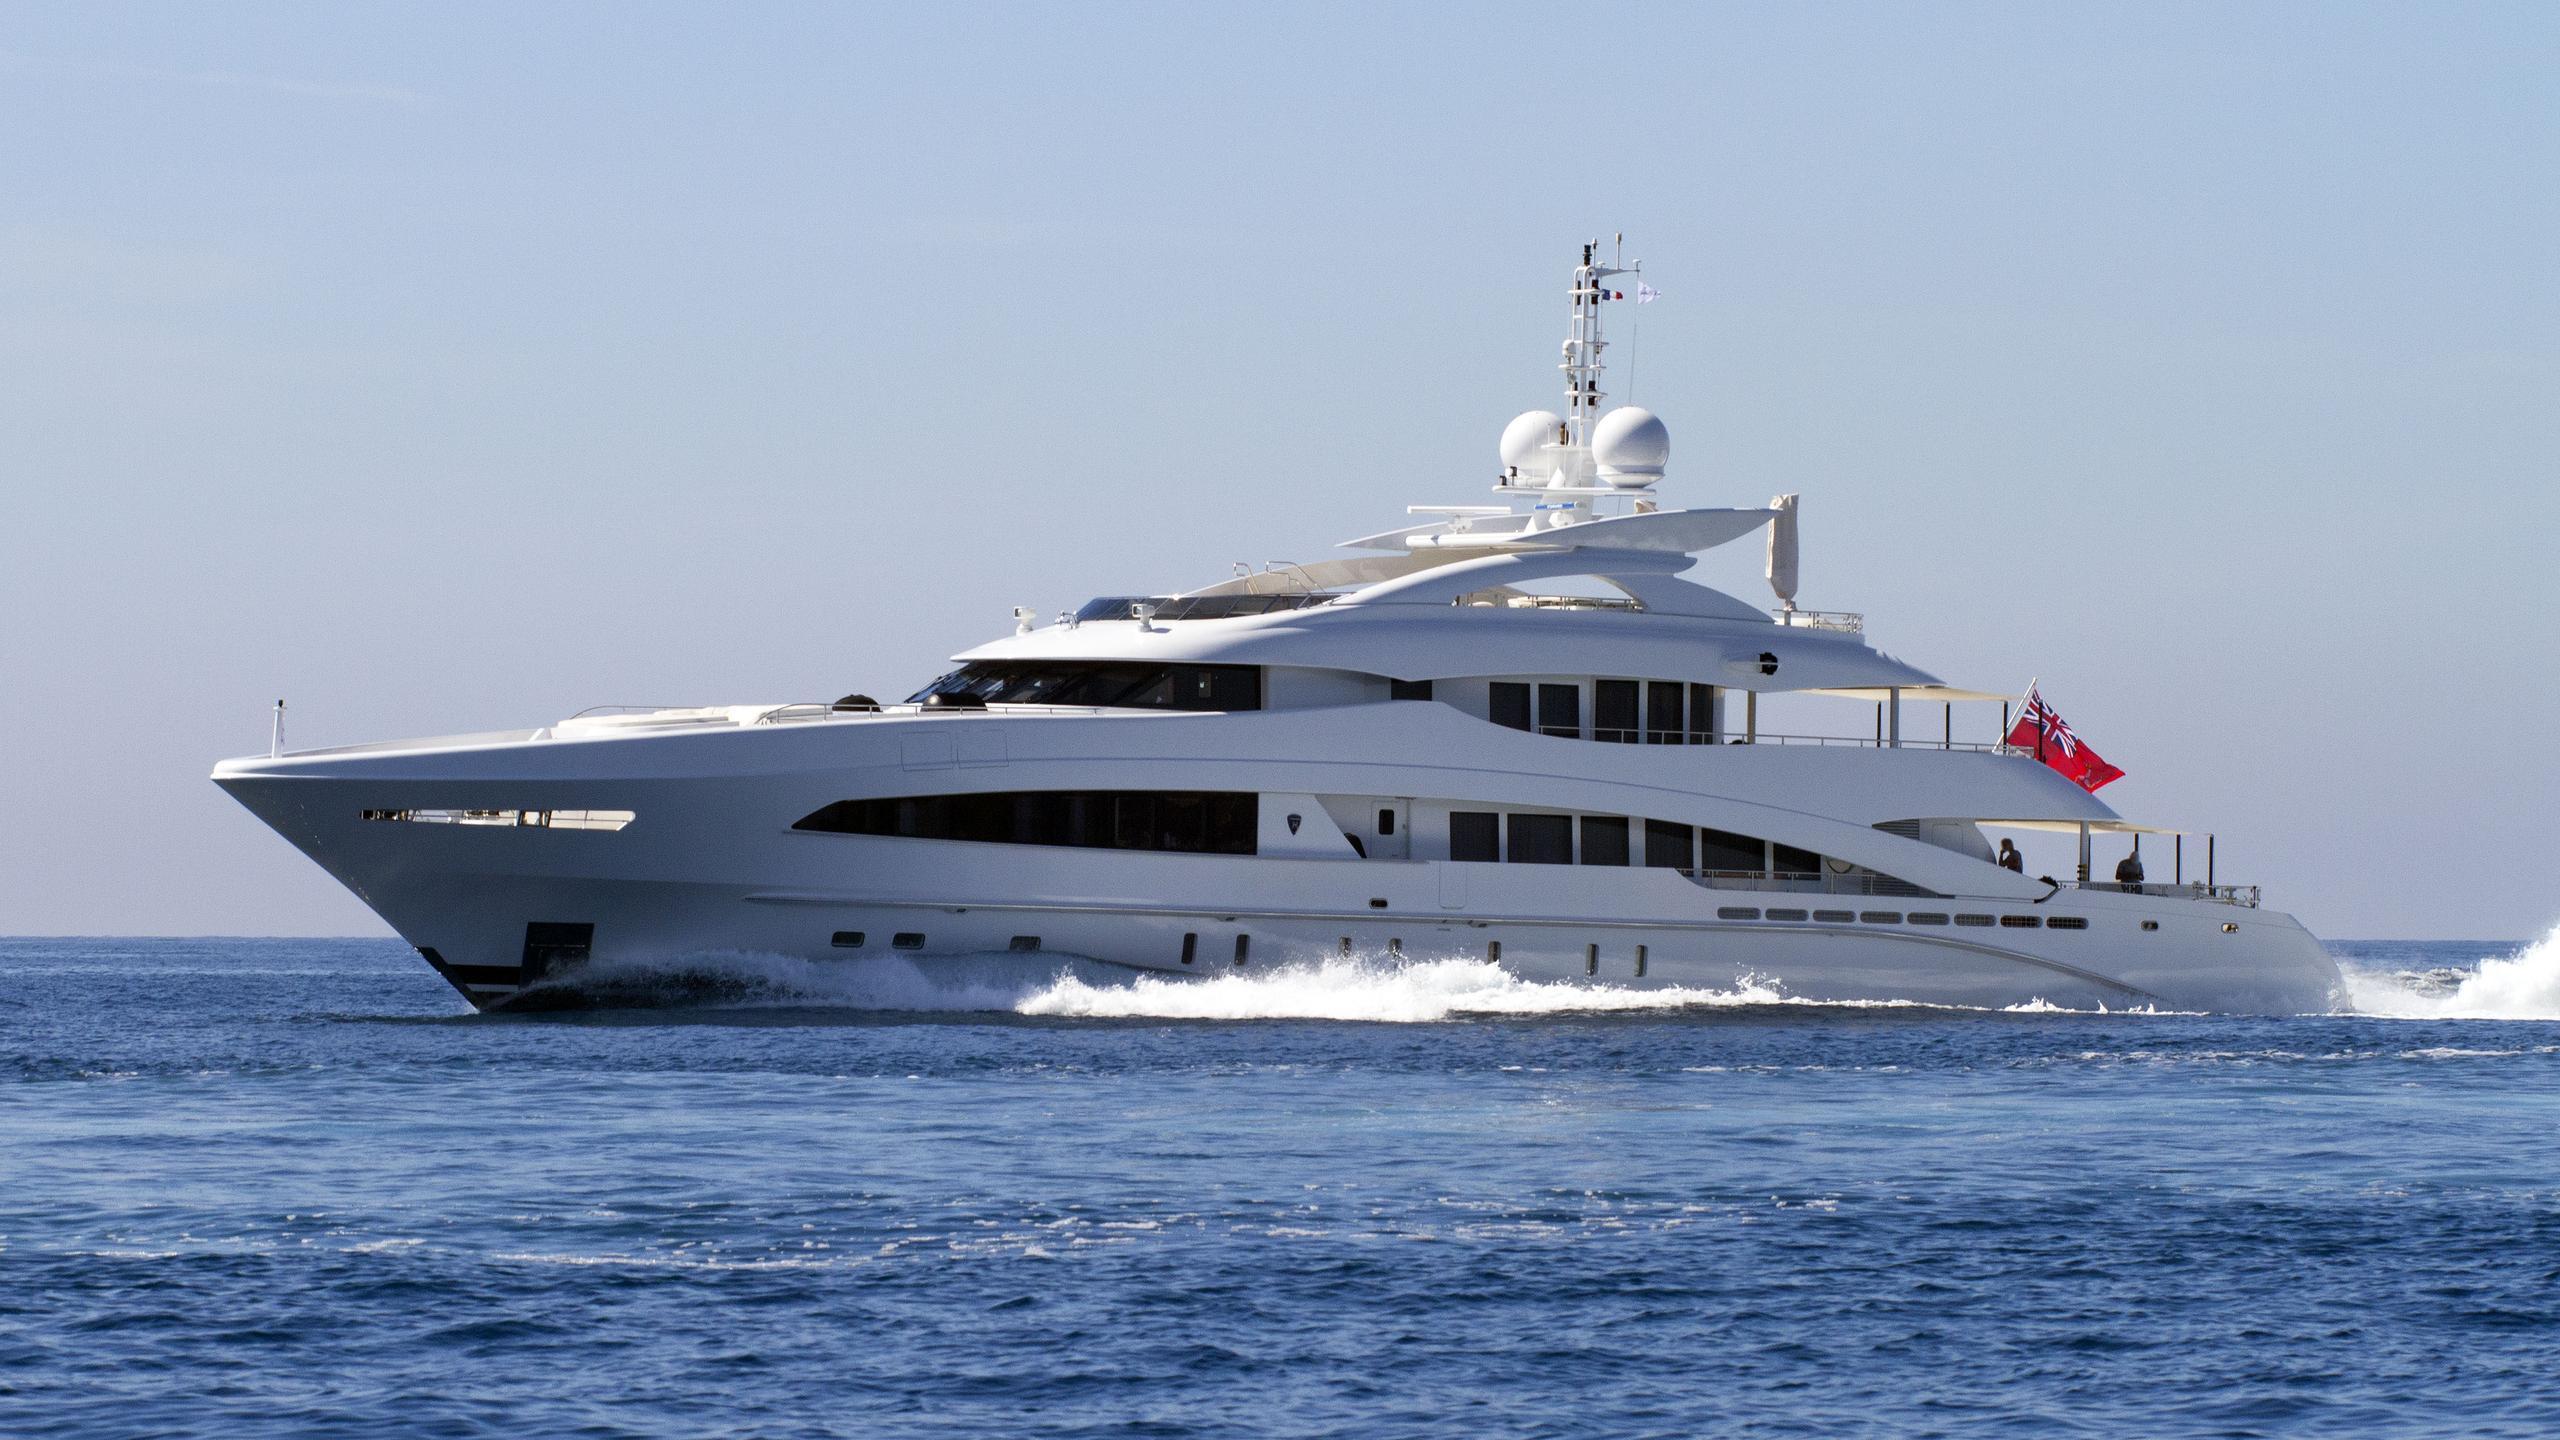 hayken-motor-yacht-heesen-2014-50m-cruising-profile